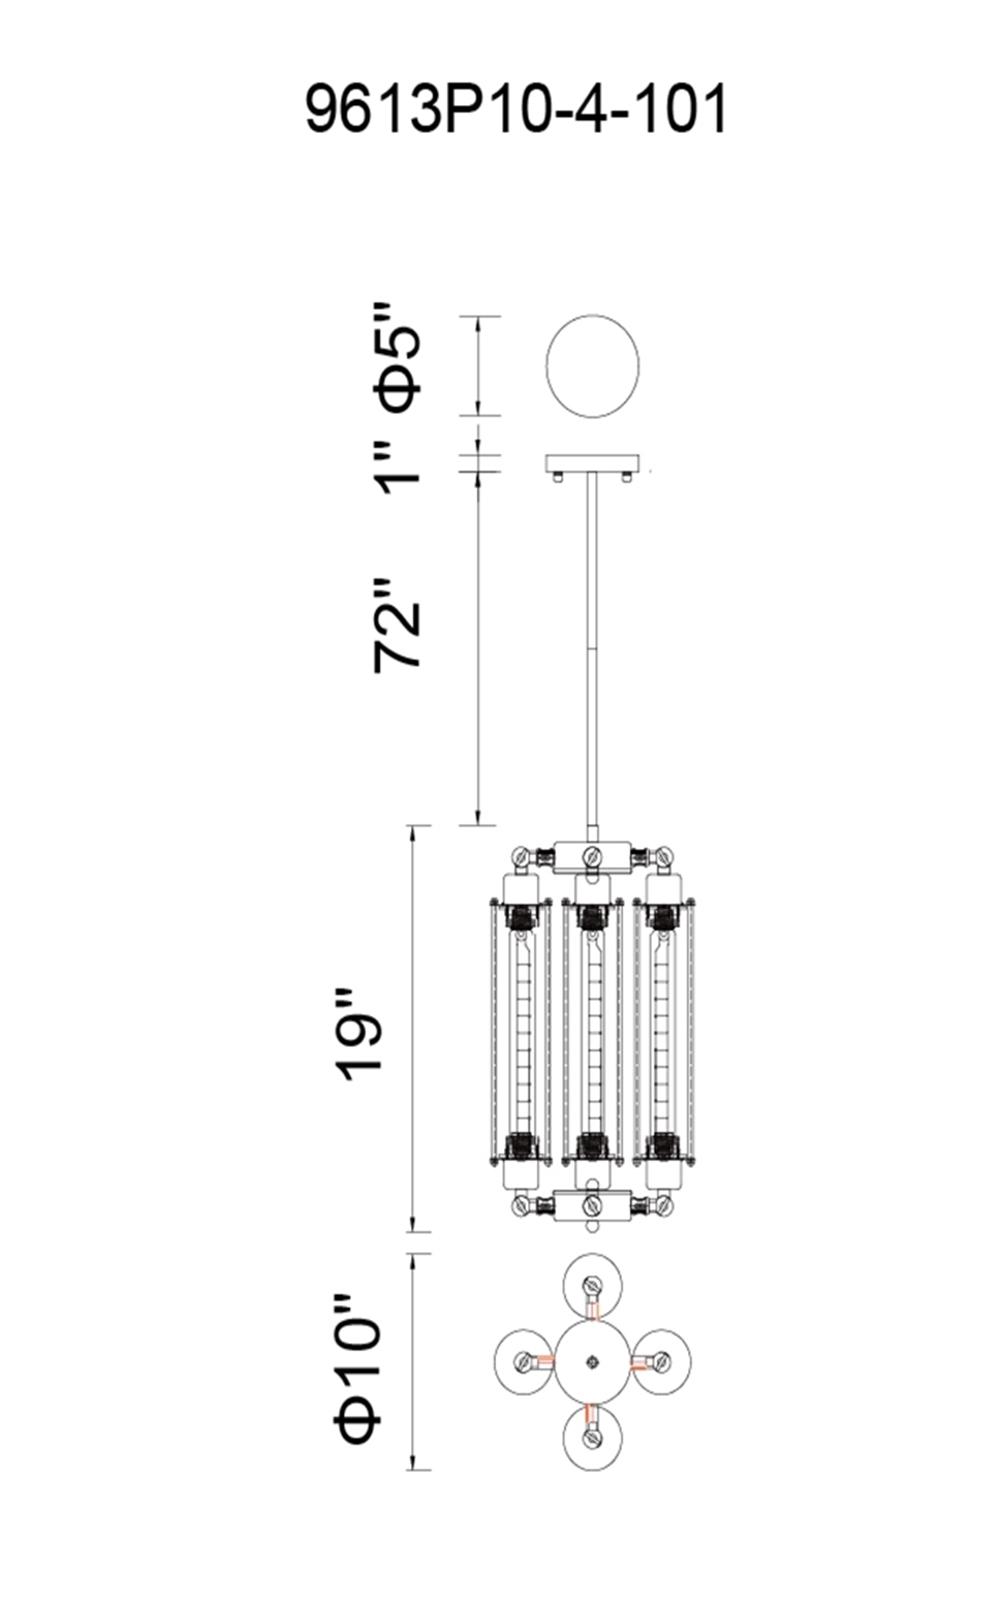 CWI Lighting Kiera 4 Light Down Mini Pendant With Black Finish Model: 9613P10-4-101 Line Drawing